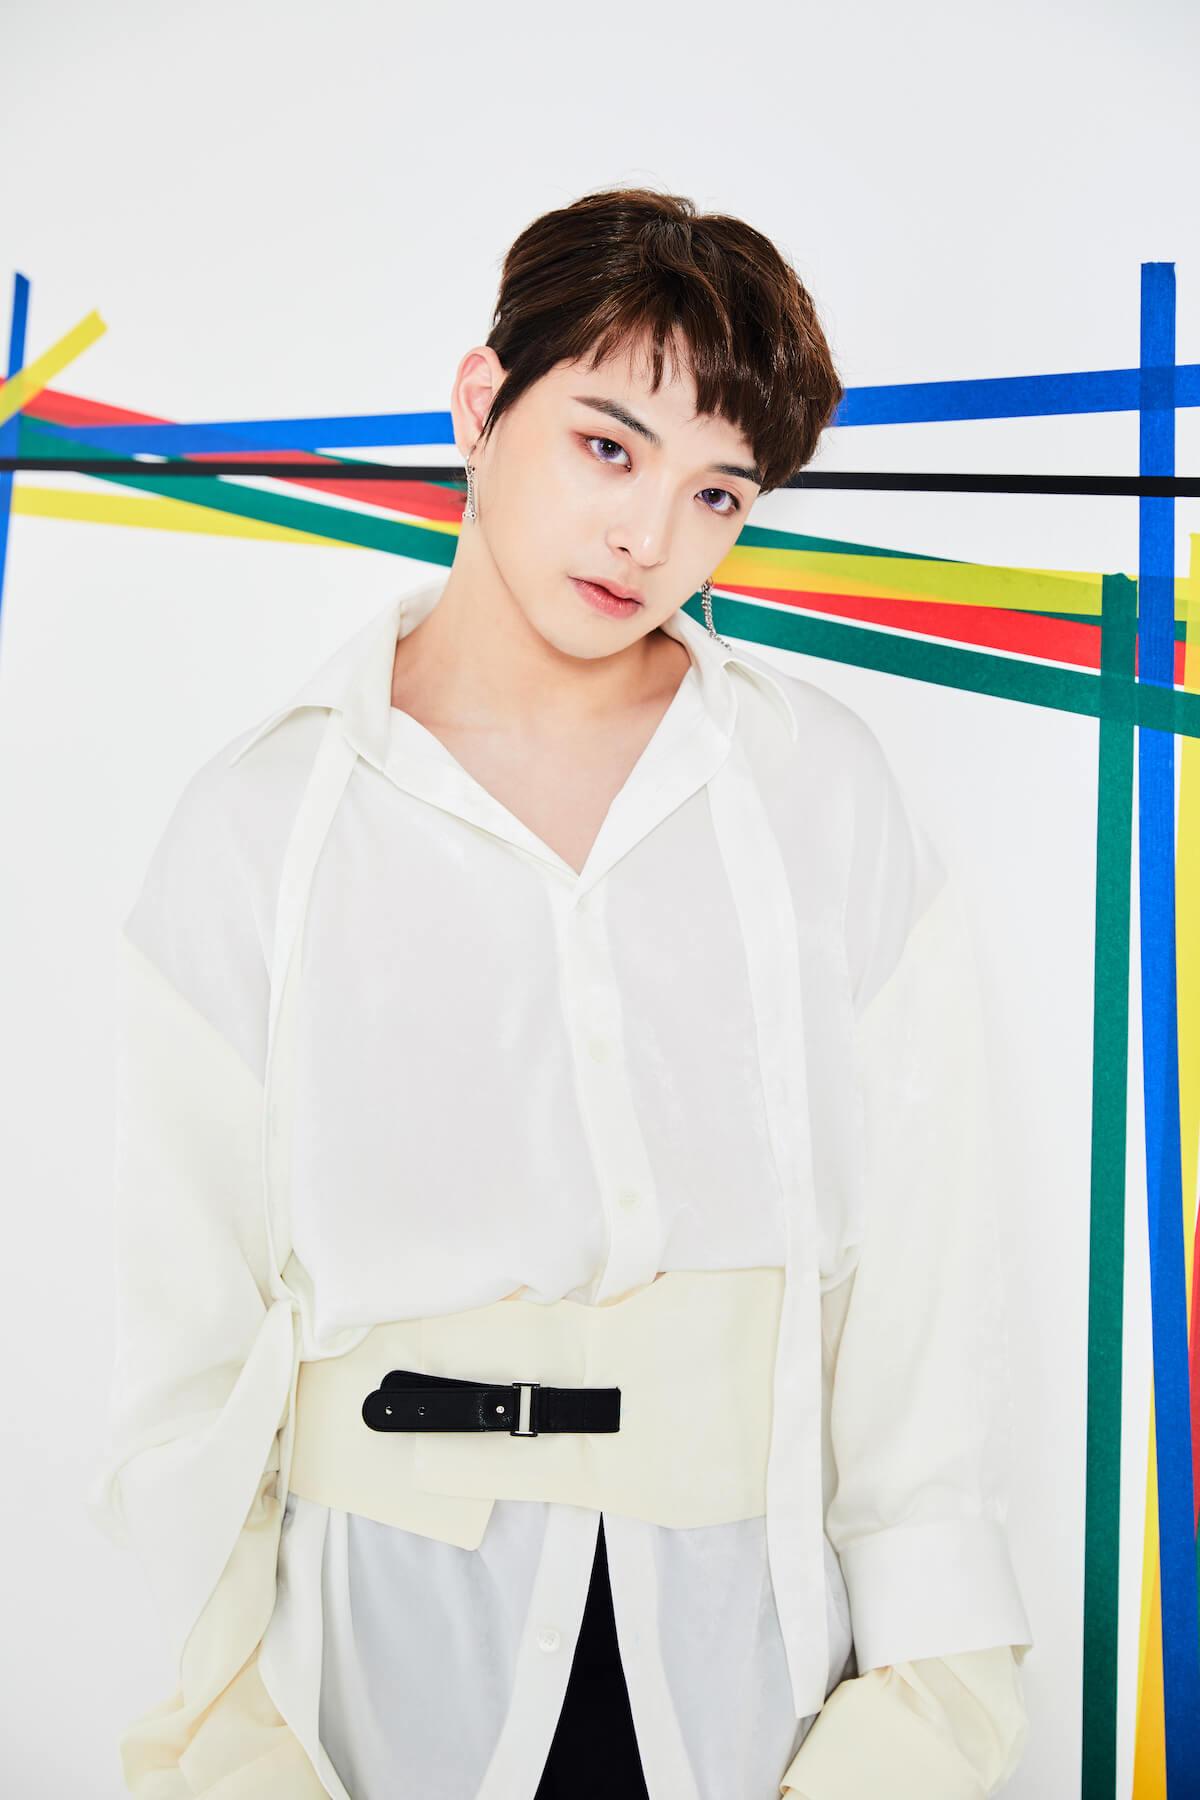 Kyeongheon profile image